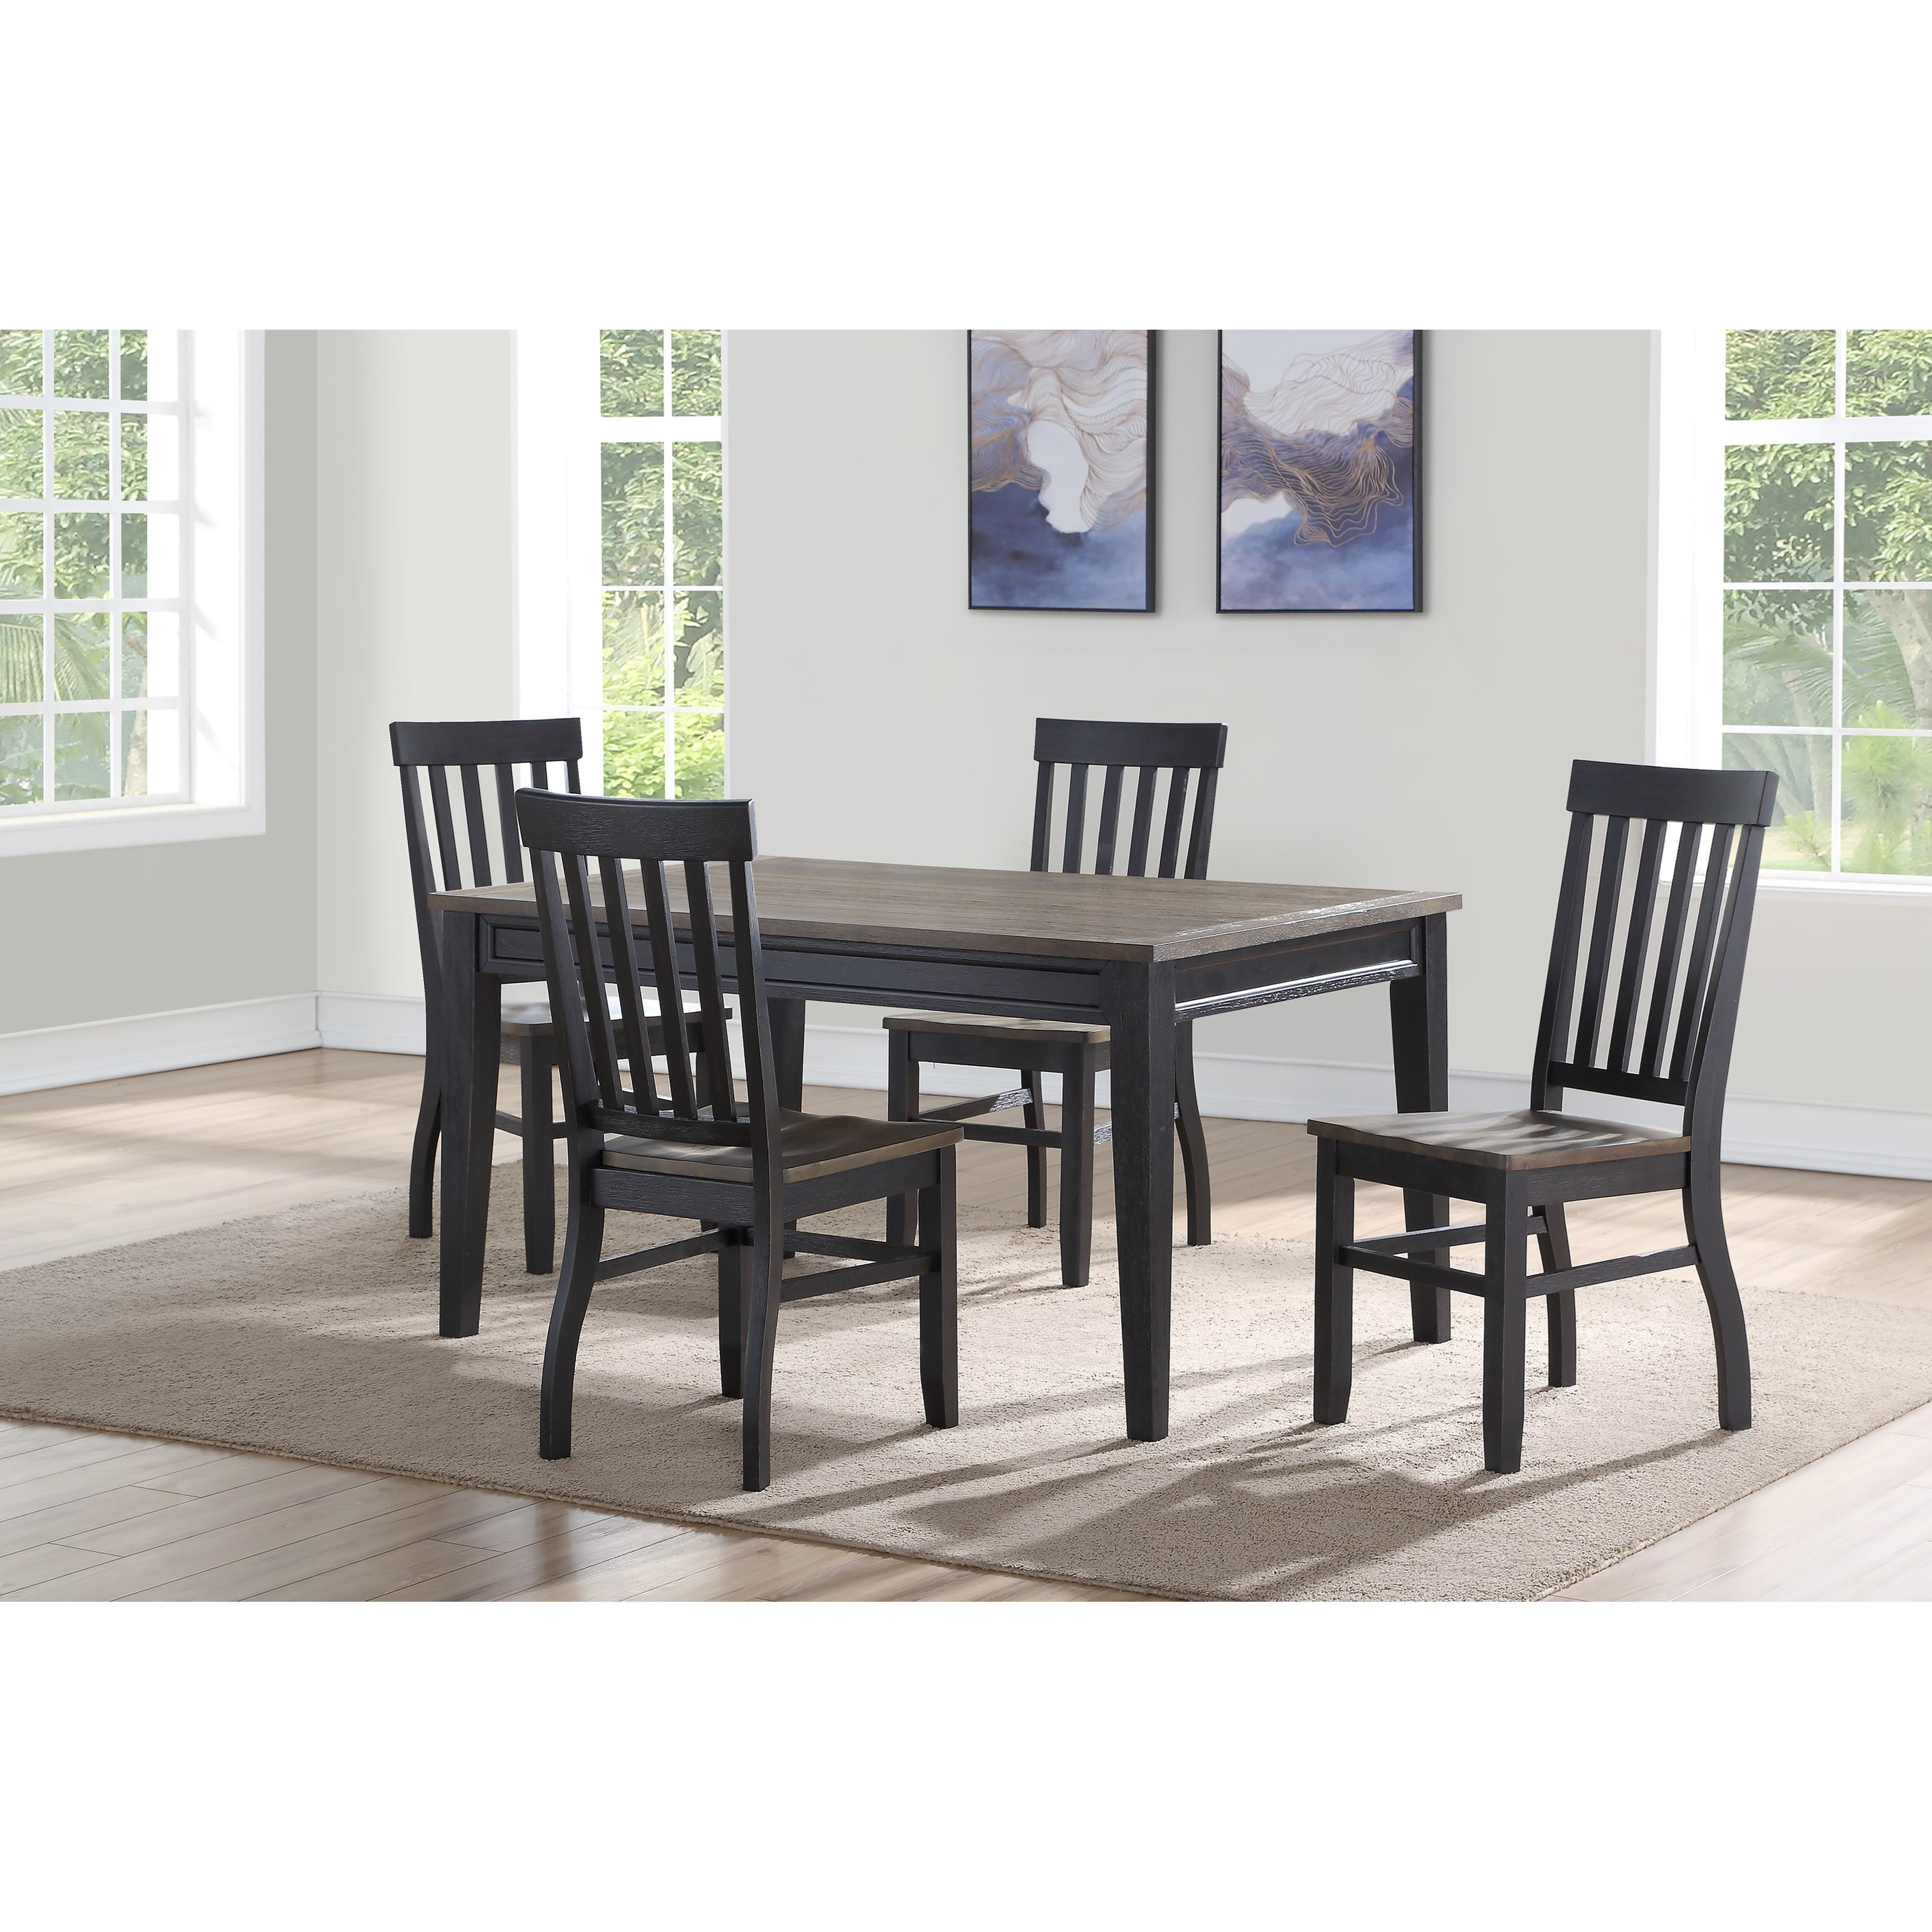 Dining Room Furniture Essentials: Belfort Essentials Raven Casual Five Piece Dining Set